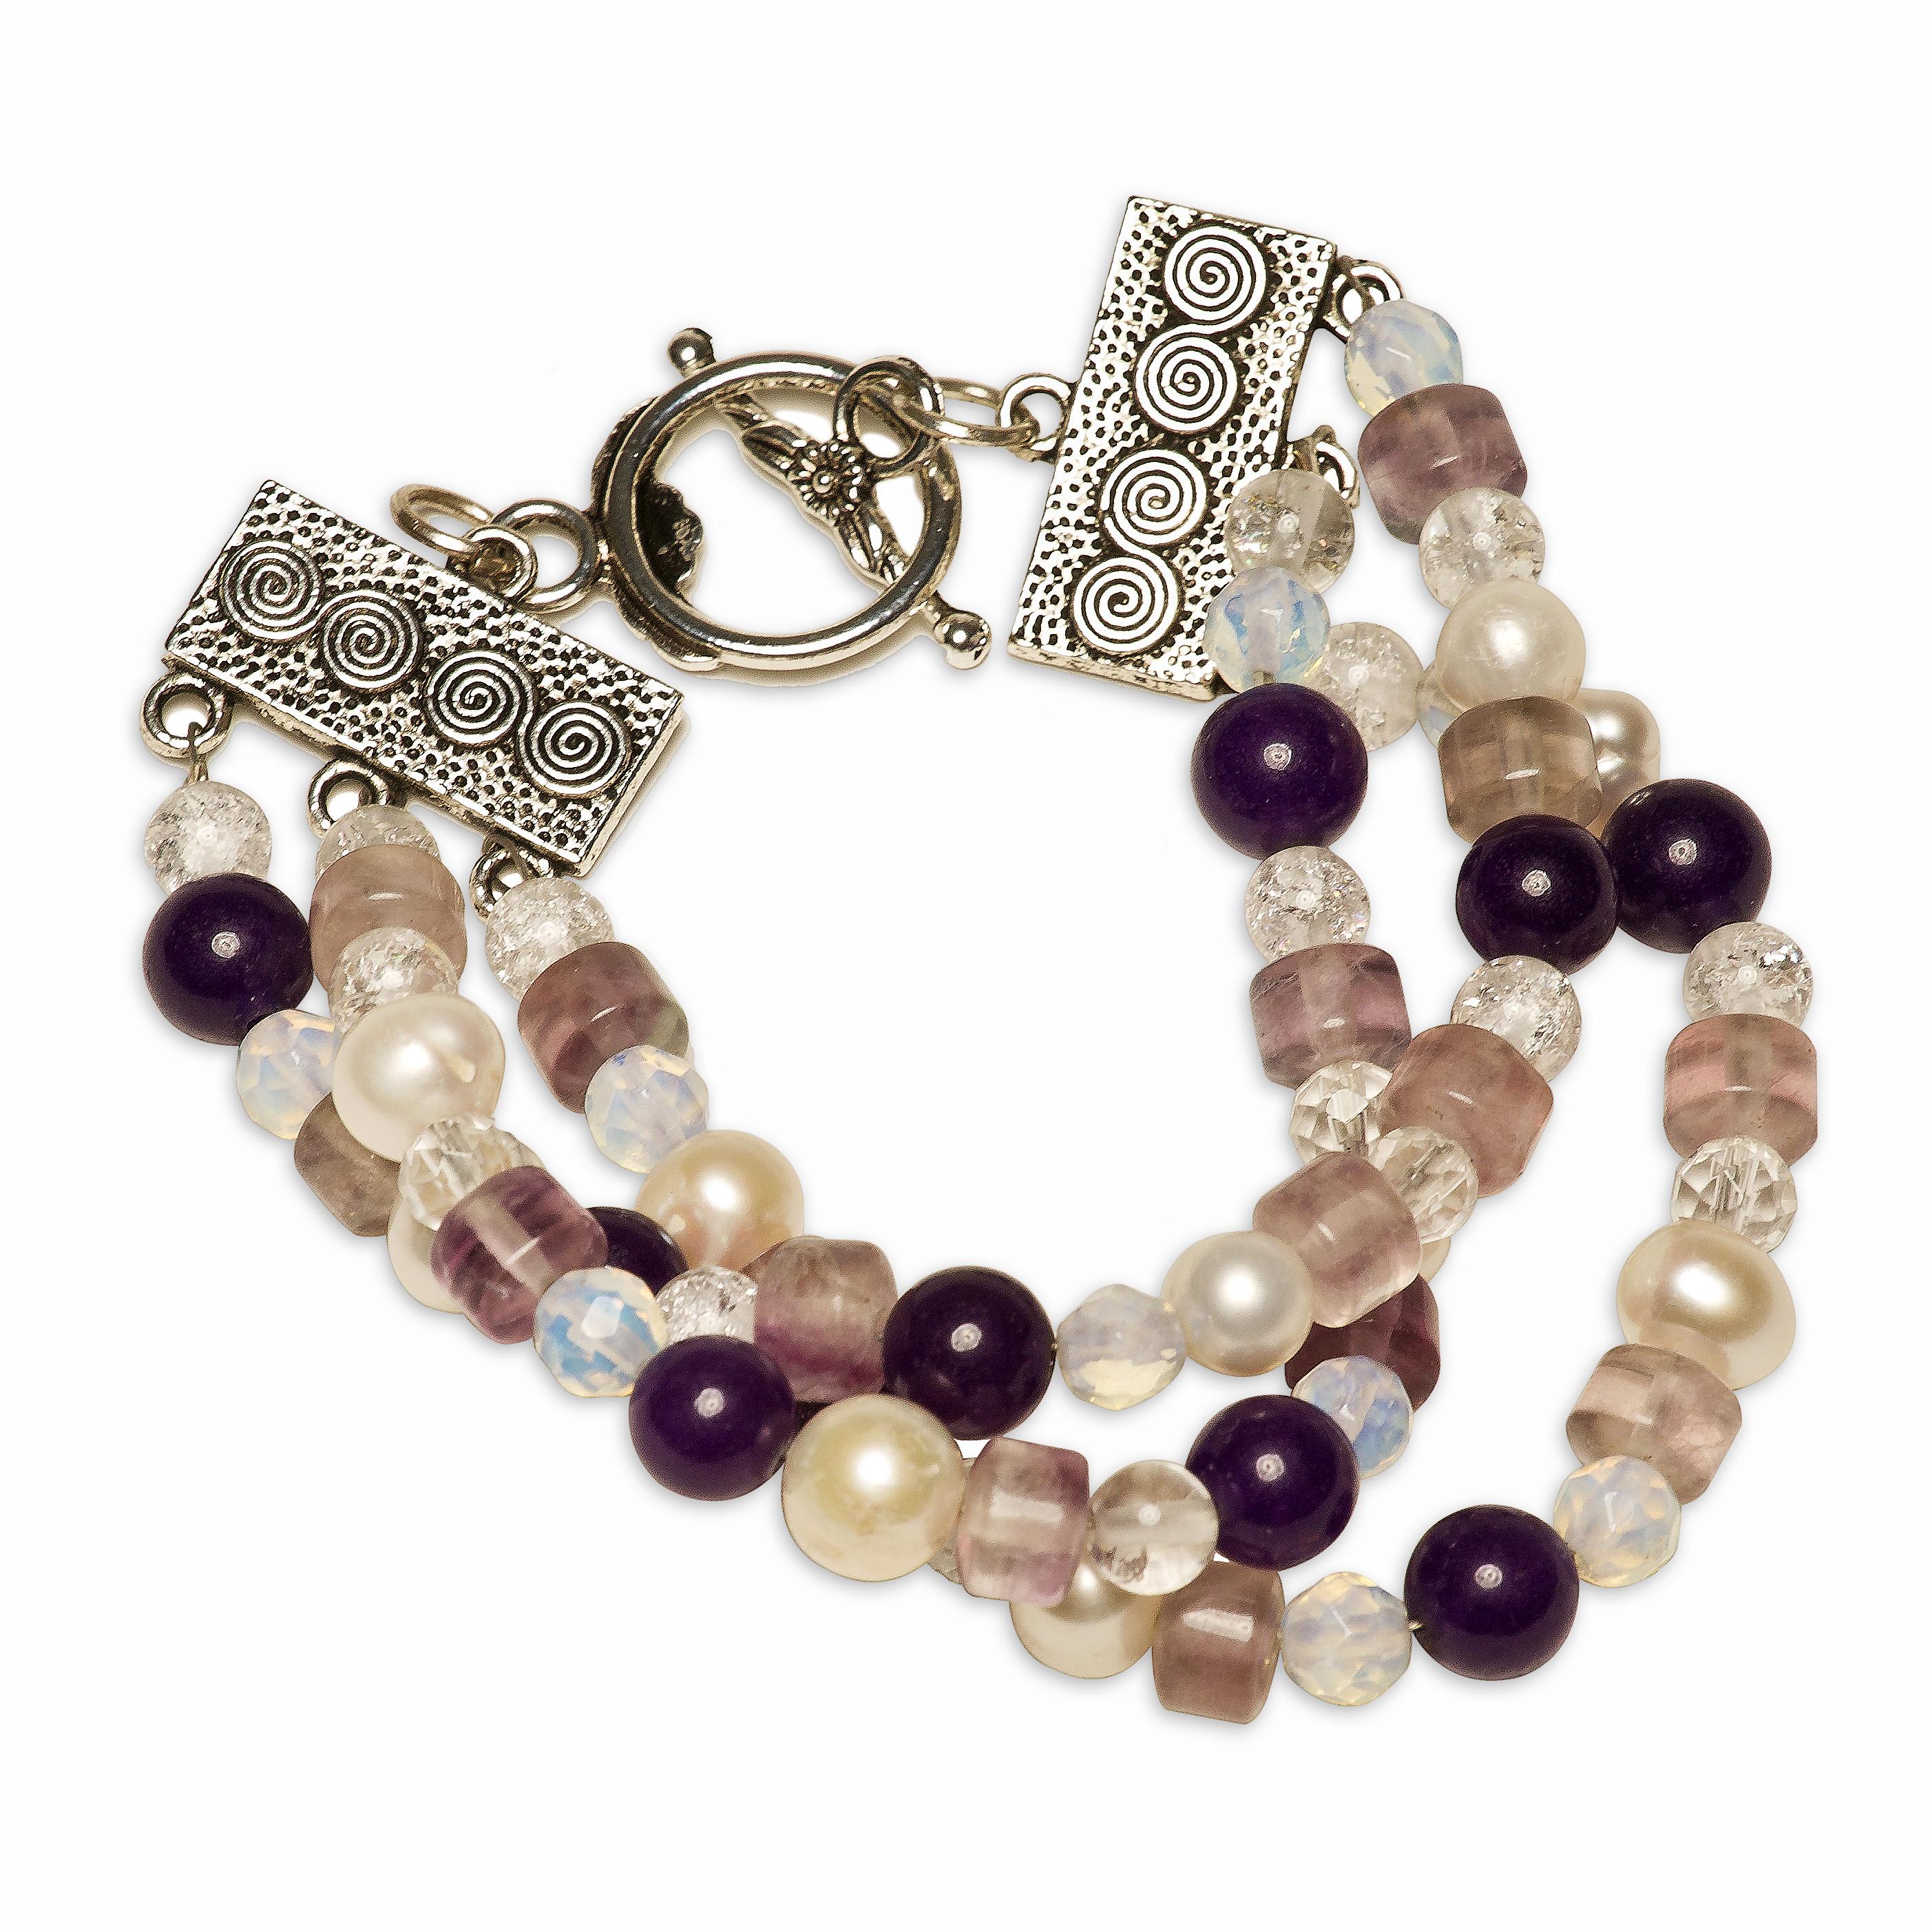 Packshoty - biżuteria_004